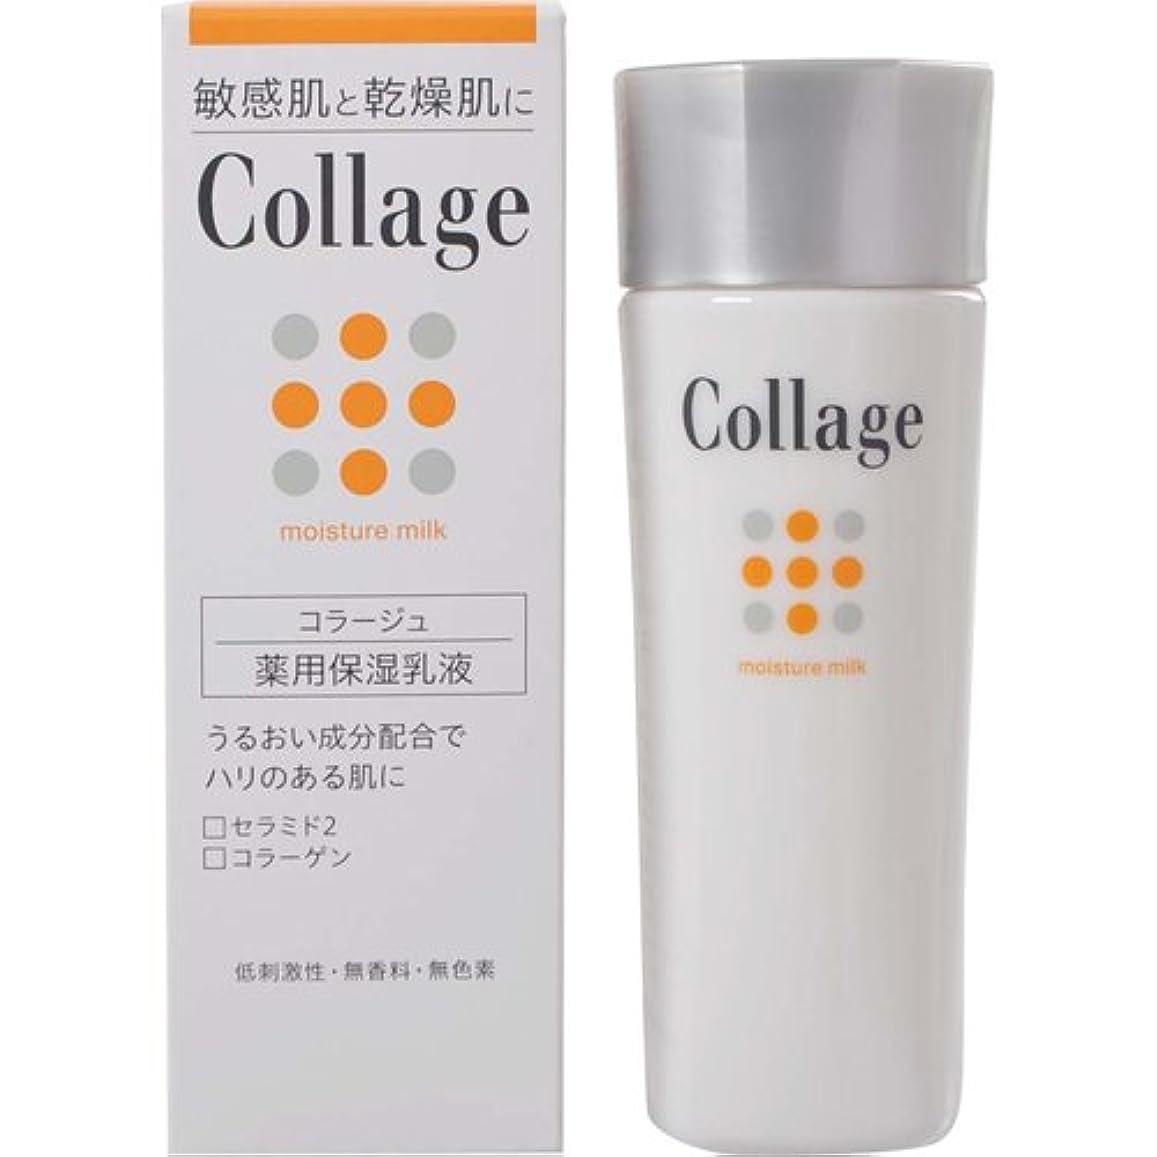 政府叙情的な接続コラージュ 薬用保湿乳液 80mL 【医薬部外品】